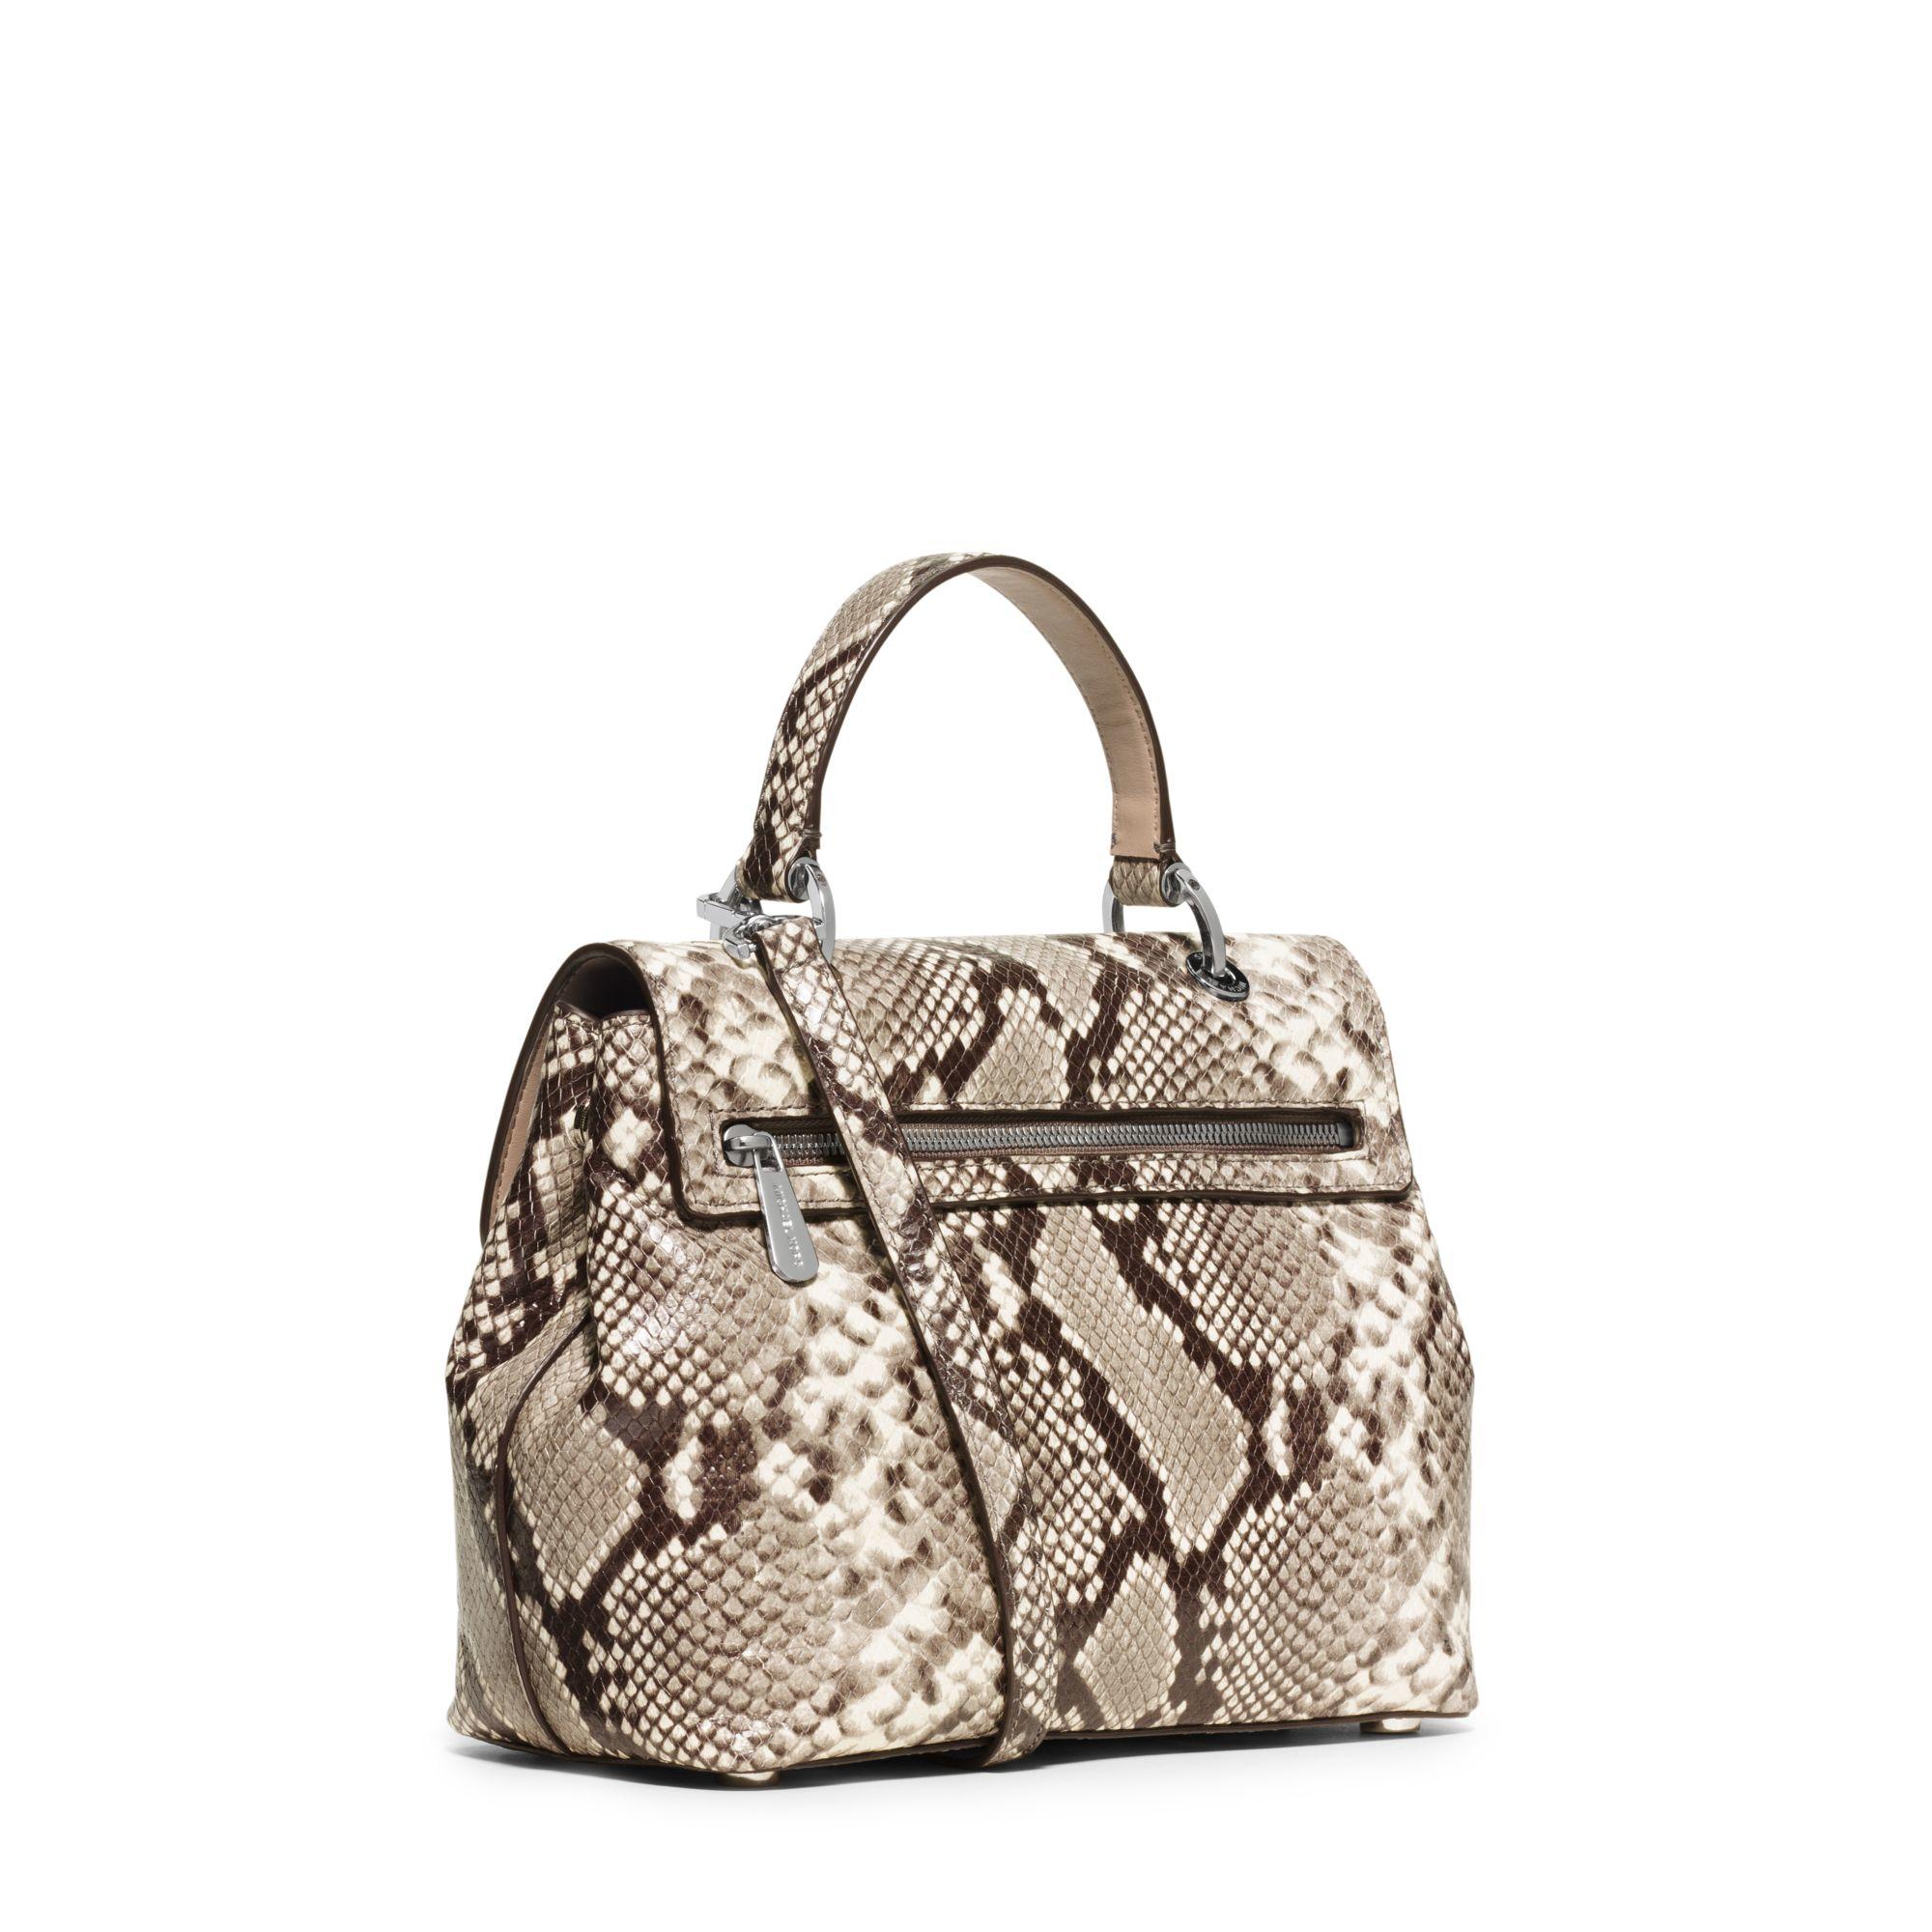 f1556c82b2c1 ... wholesale lyst michael kors emery medium embossed leather satchel in  natural 72e24 6dce5